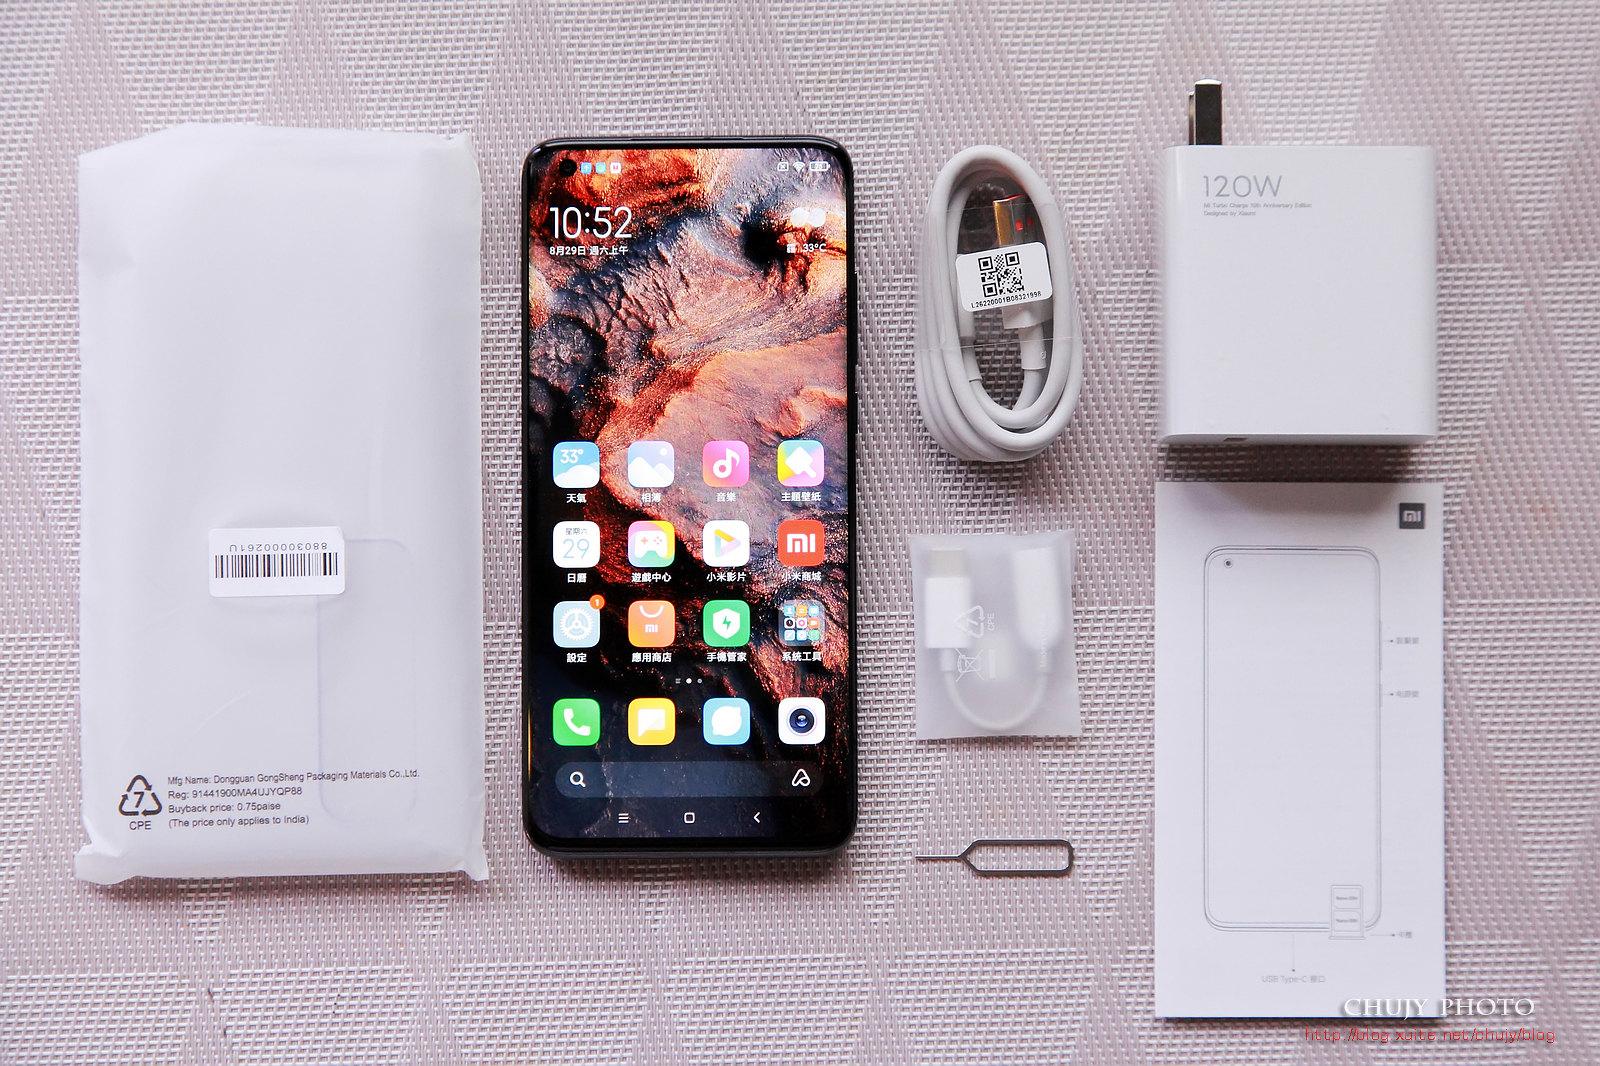 DxOmark 最強照相手機:小米 10 至尊版在台開箱實測 Mi 10 Ultra review - 1